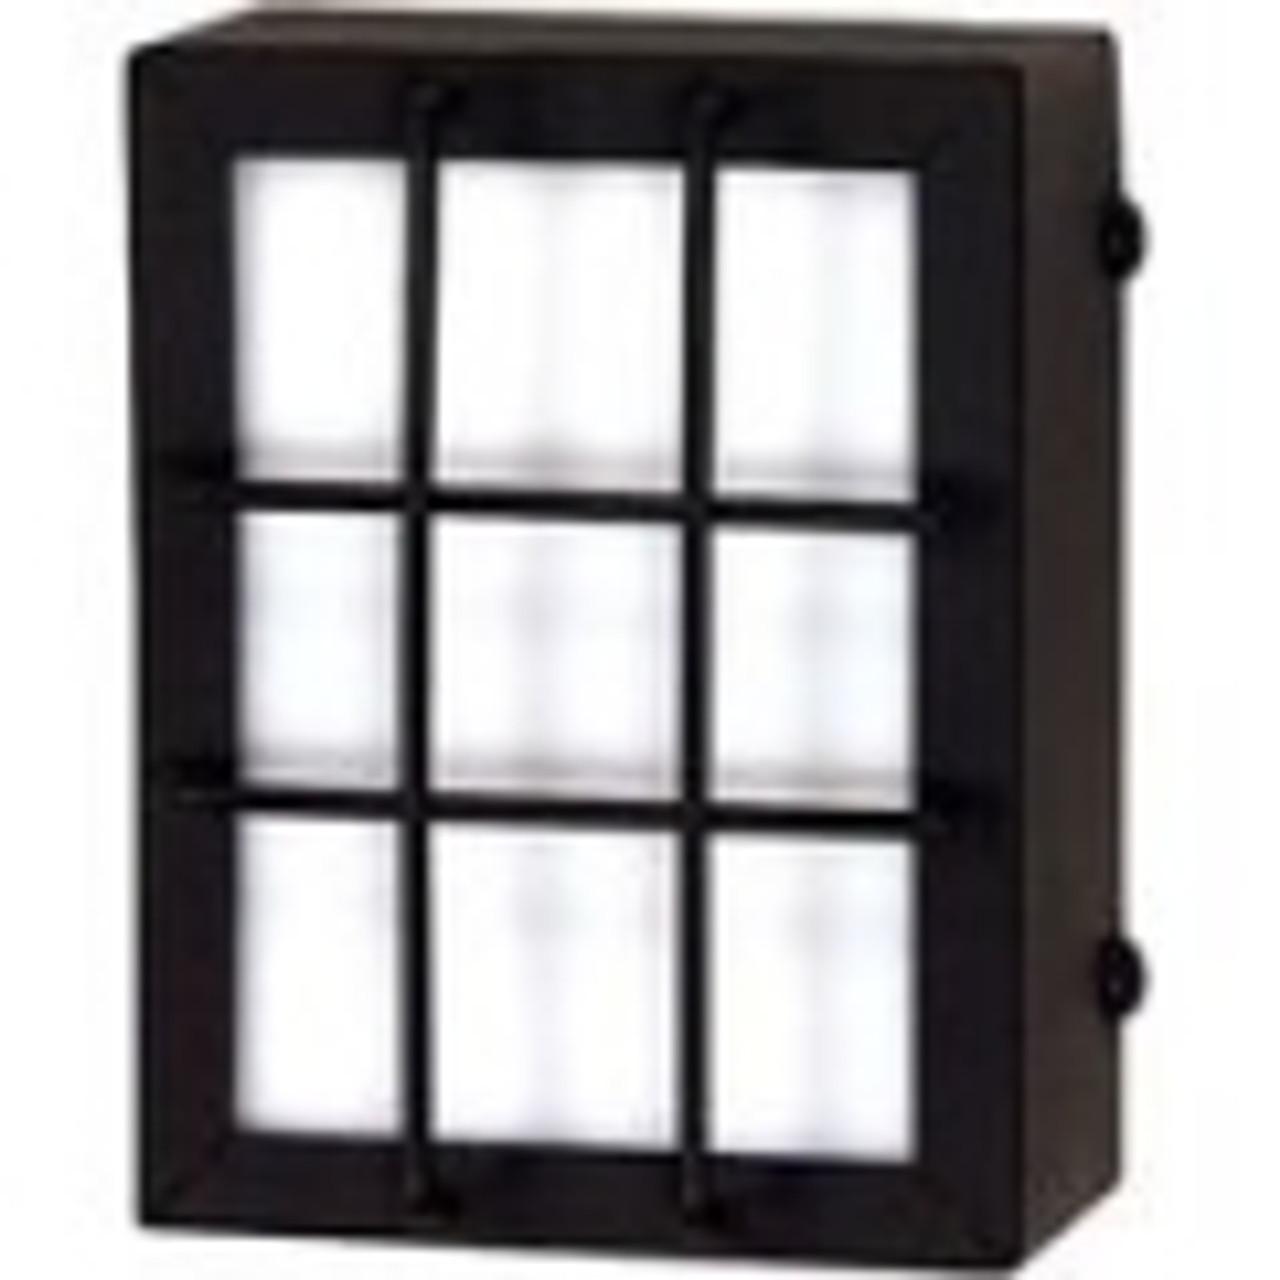 MiniStep & Deck Lights